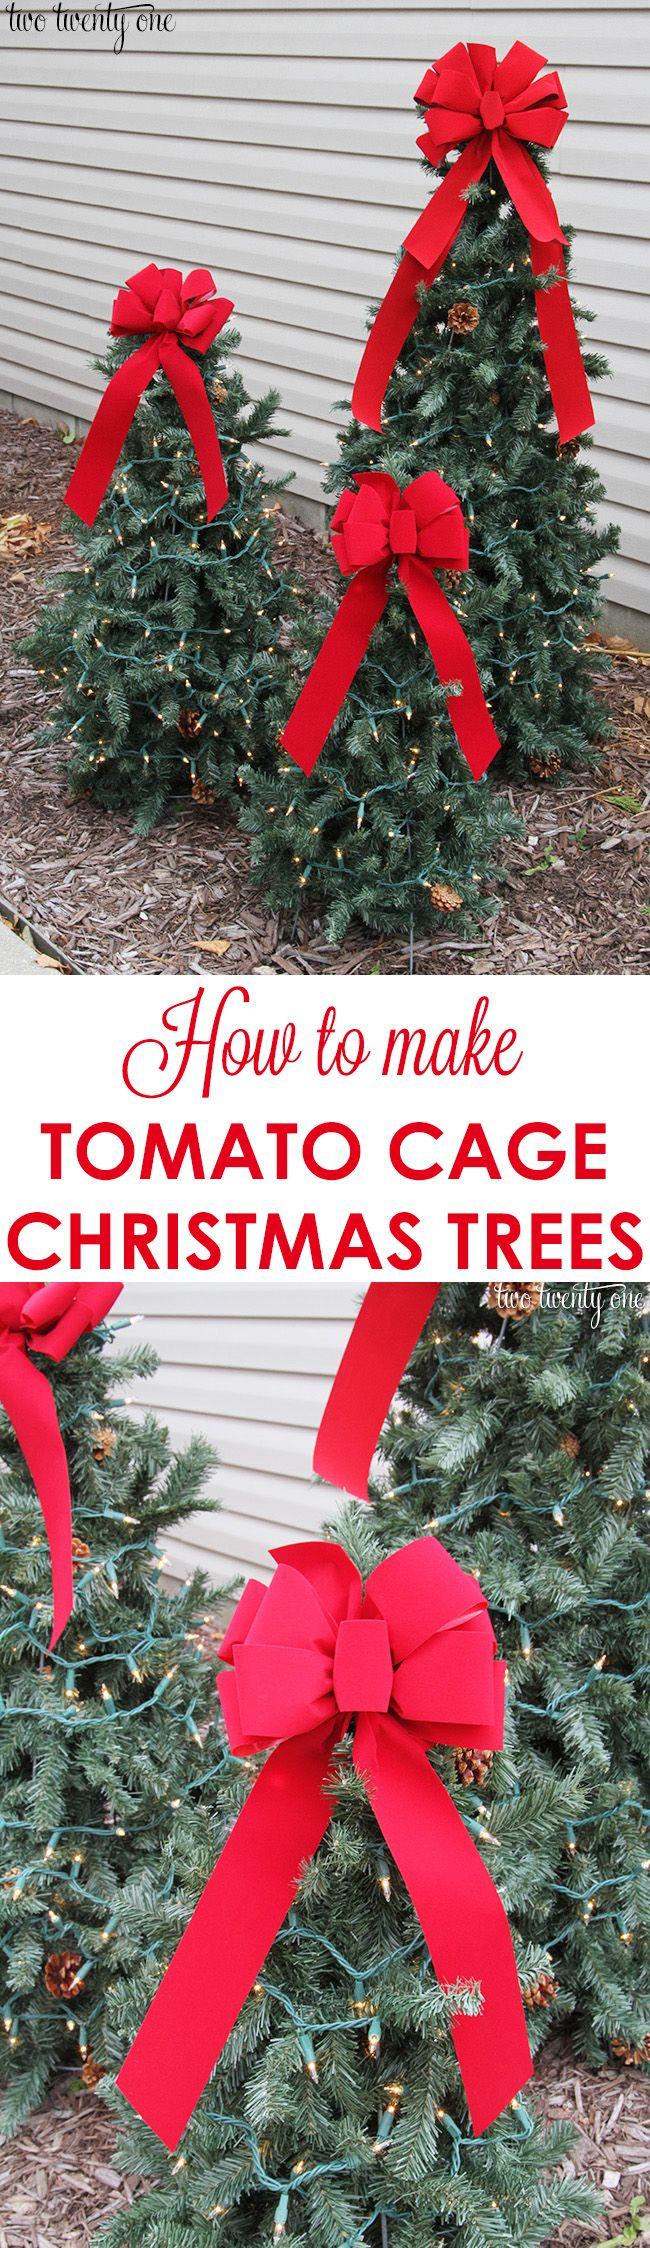 Tiered Tomato Cage Christmas Trees | Tomato cage, Christmas tree ...